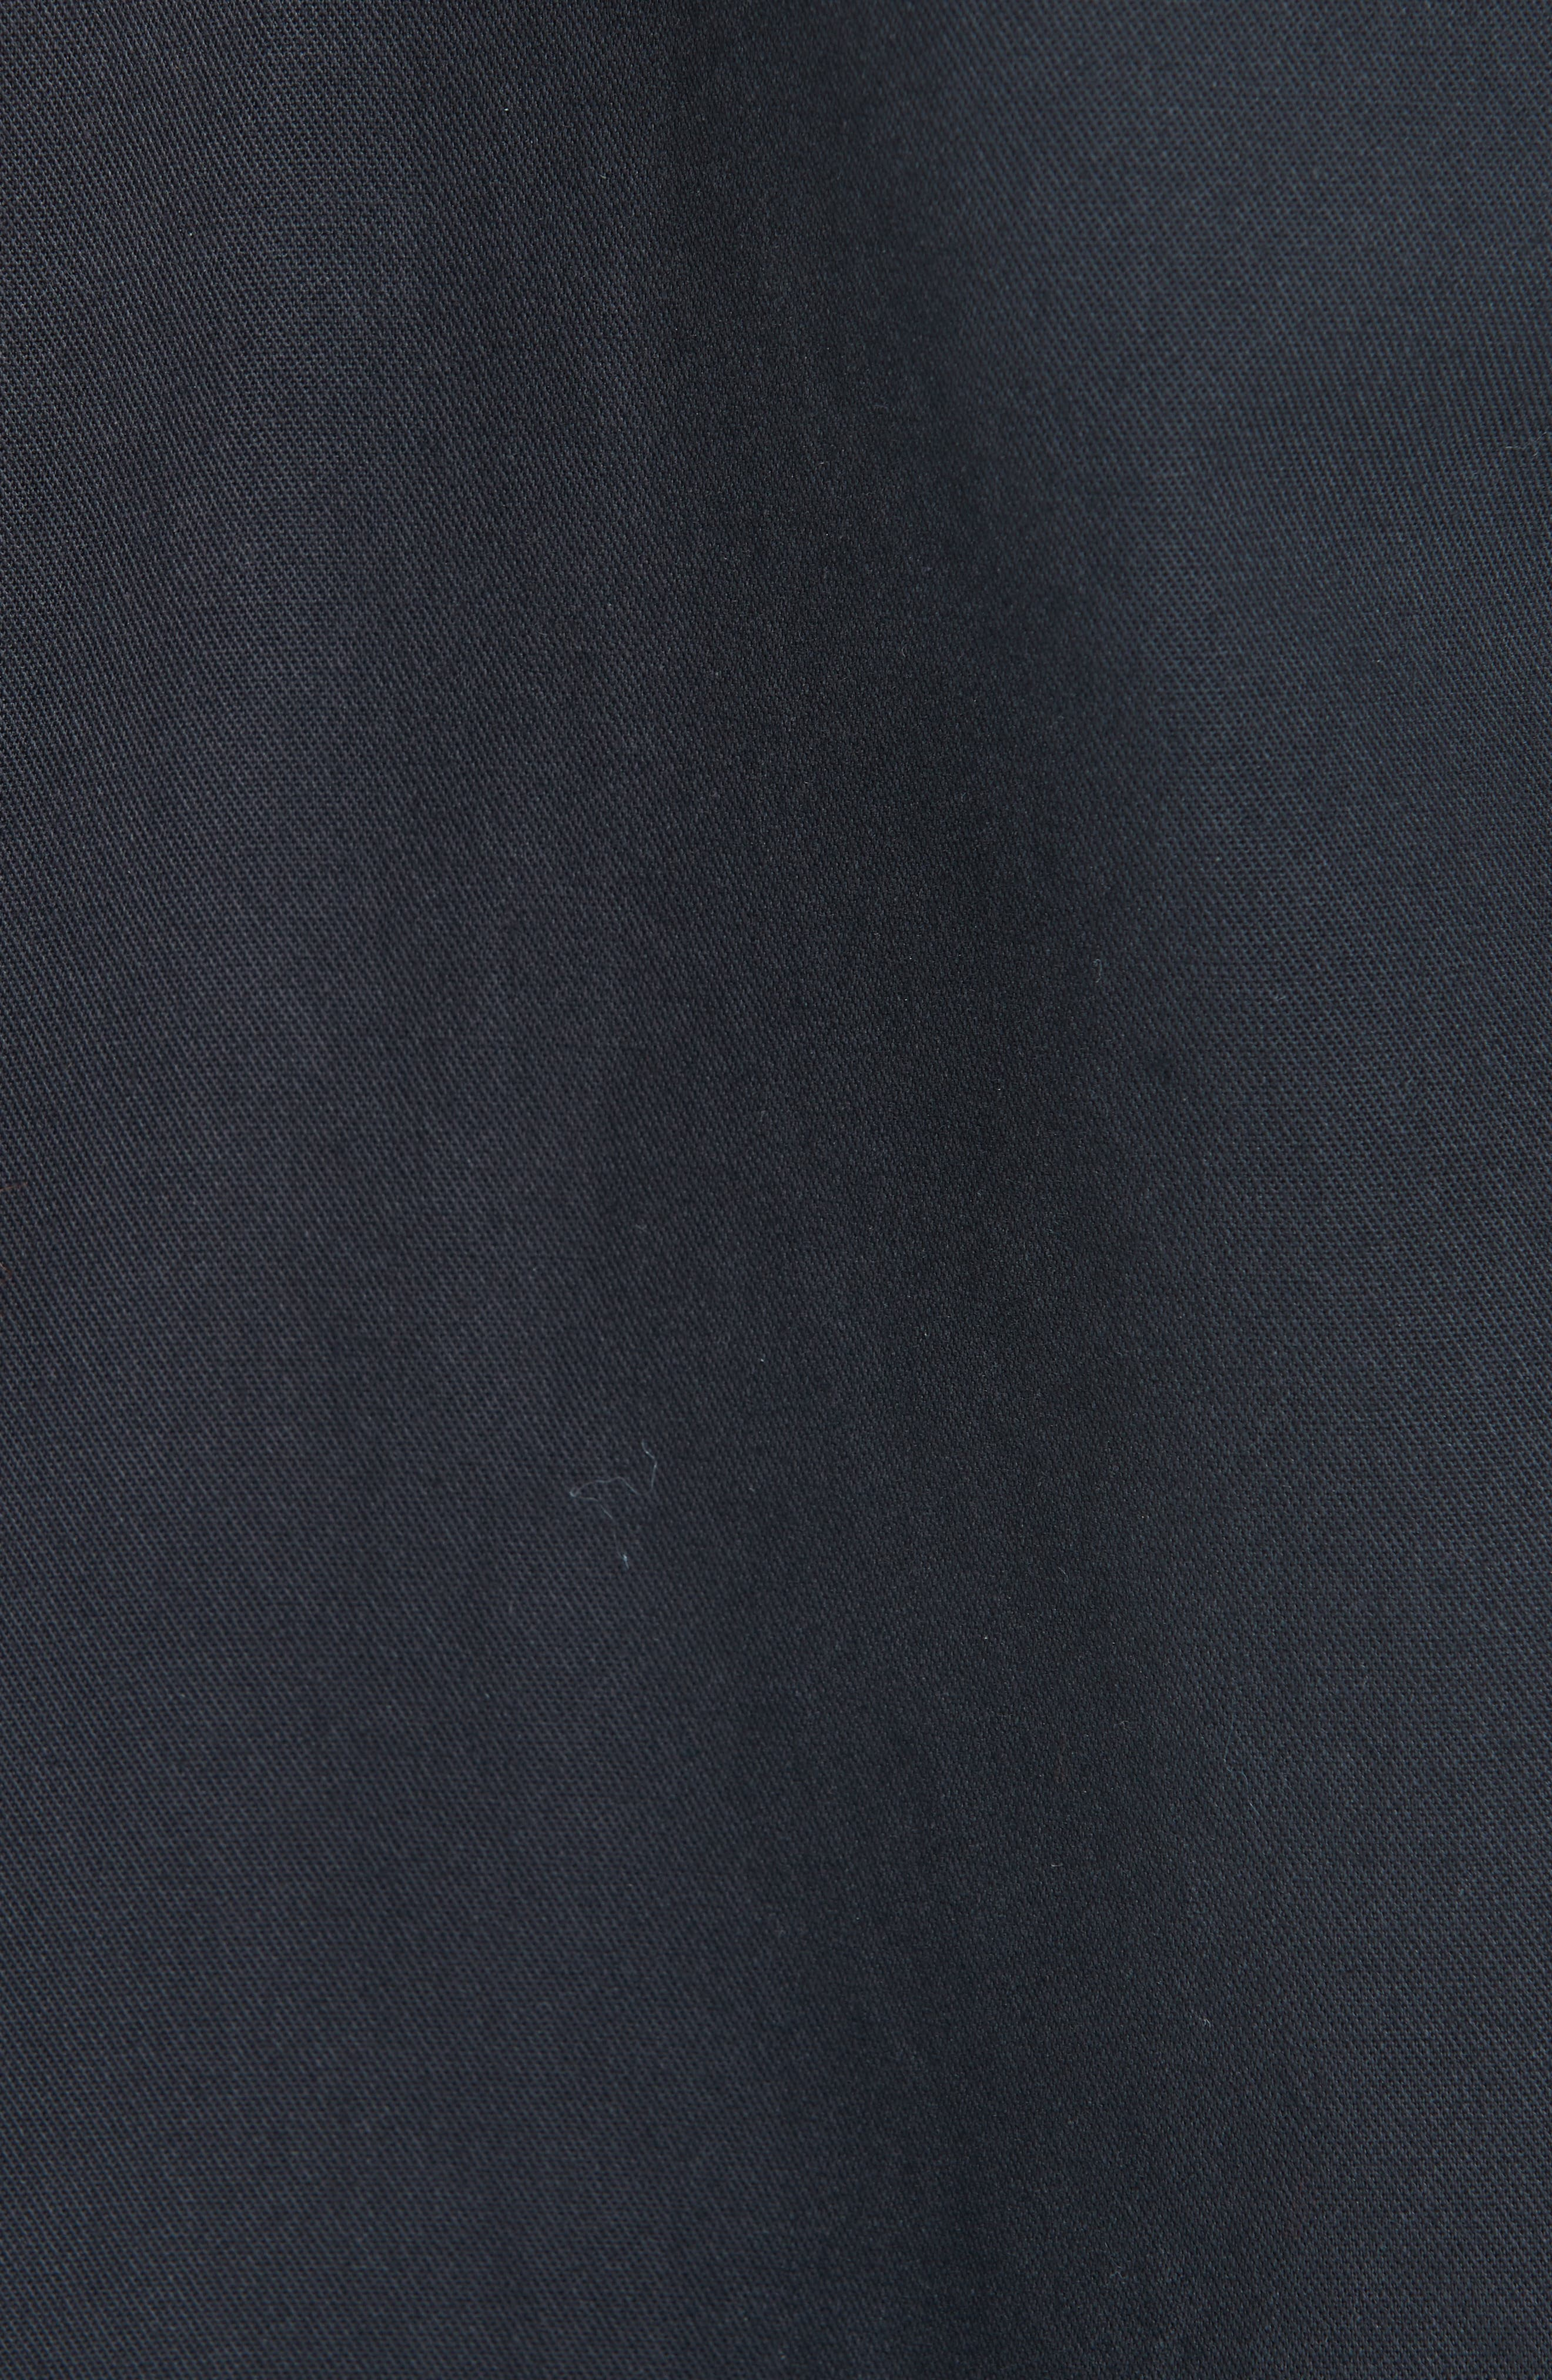 Fireman Coat,                             Alternate thumbnail 7, color,                             BLACK